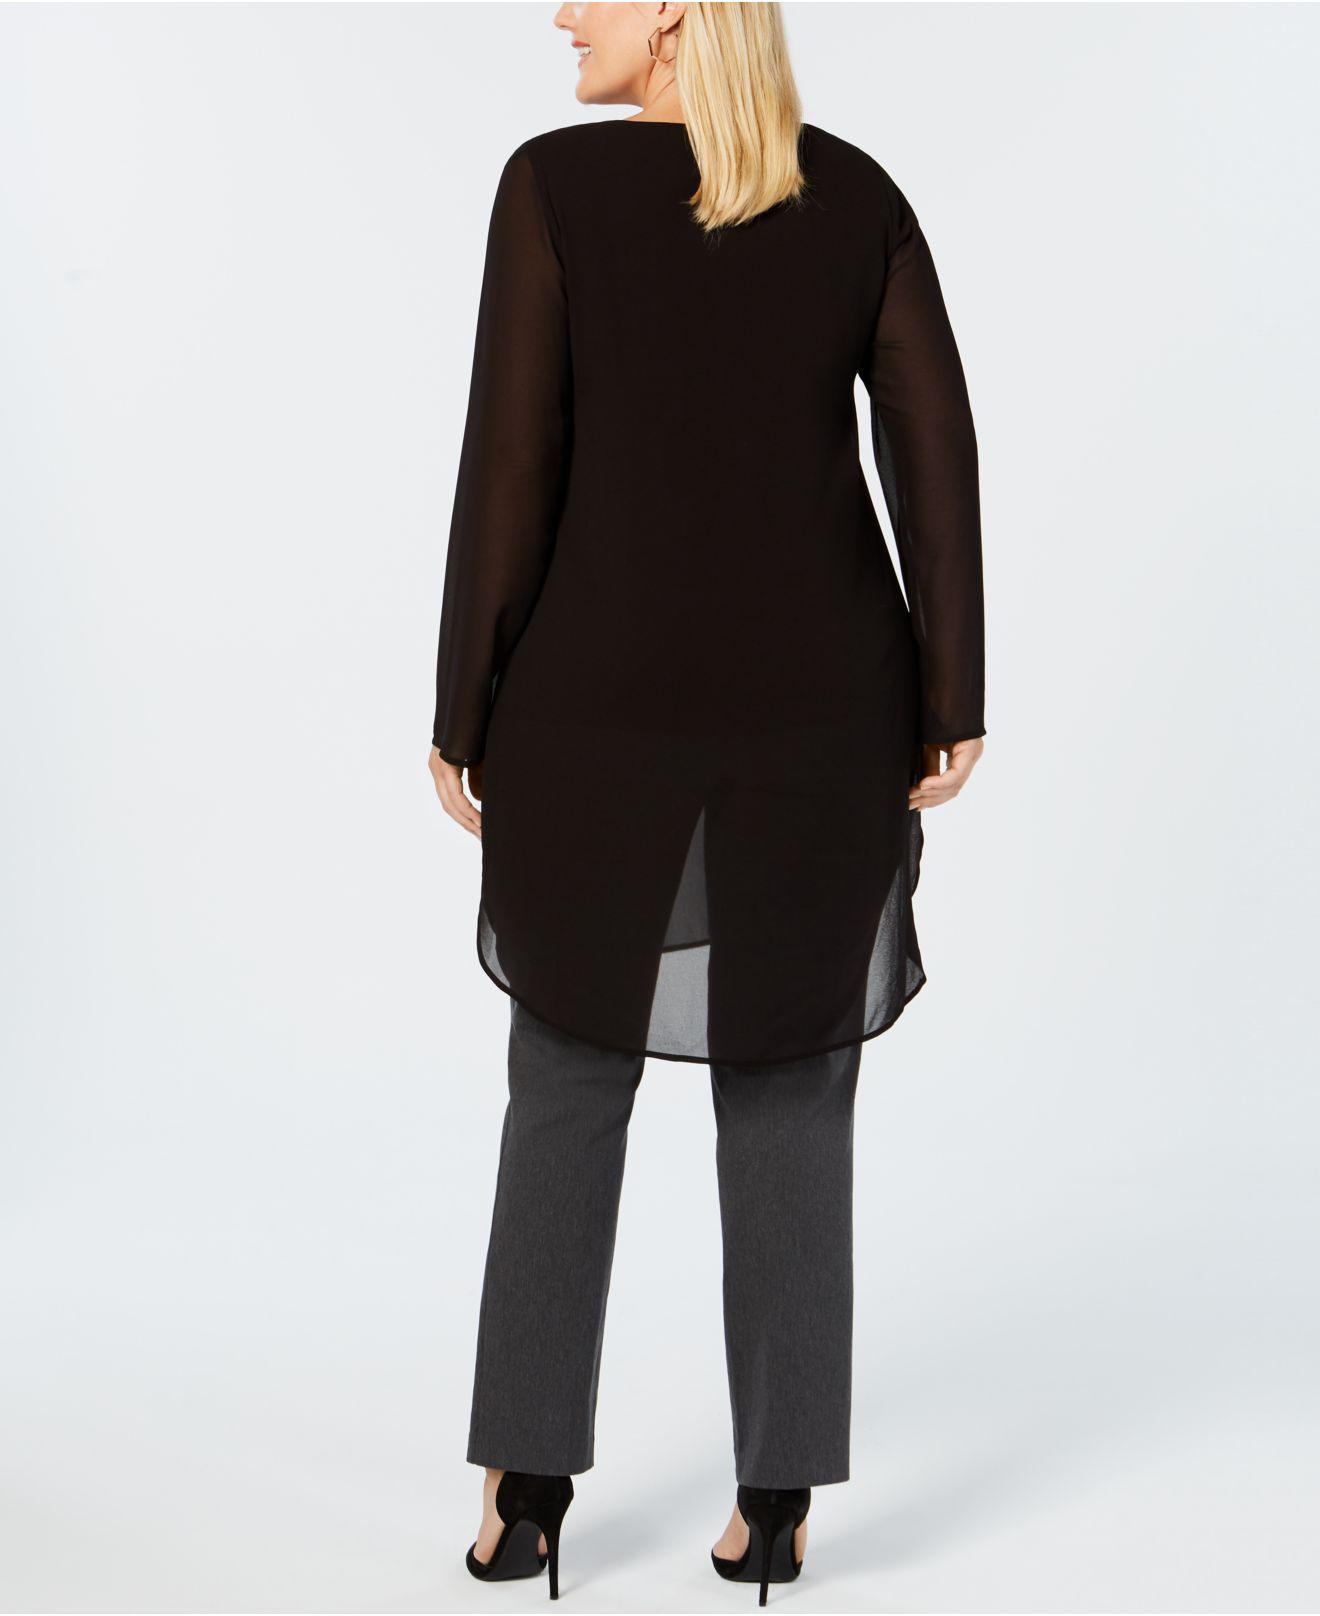 d384b78f72b0f Lyst - Alfani Plus Size Printed Tunic Blouse